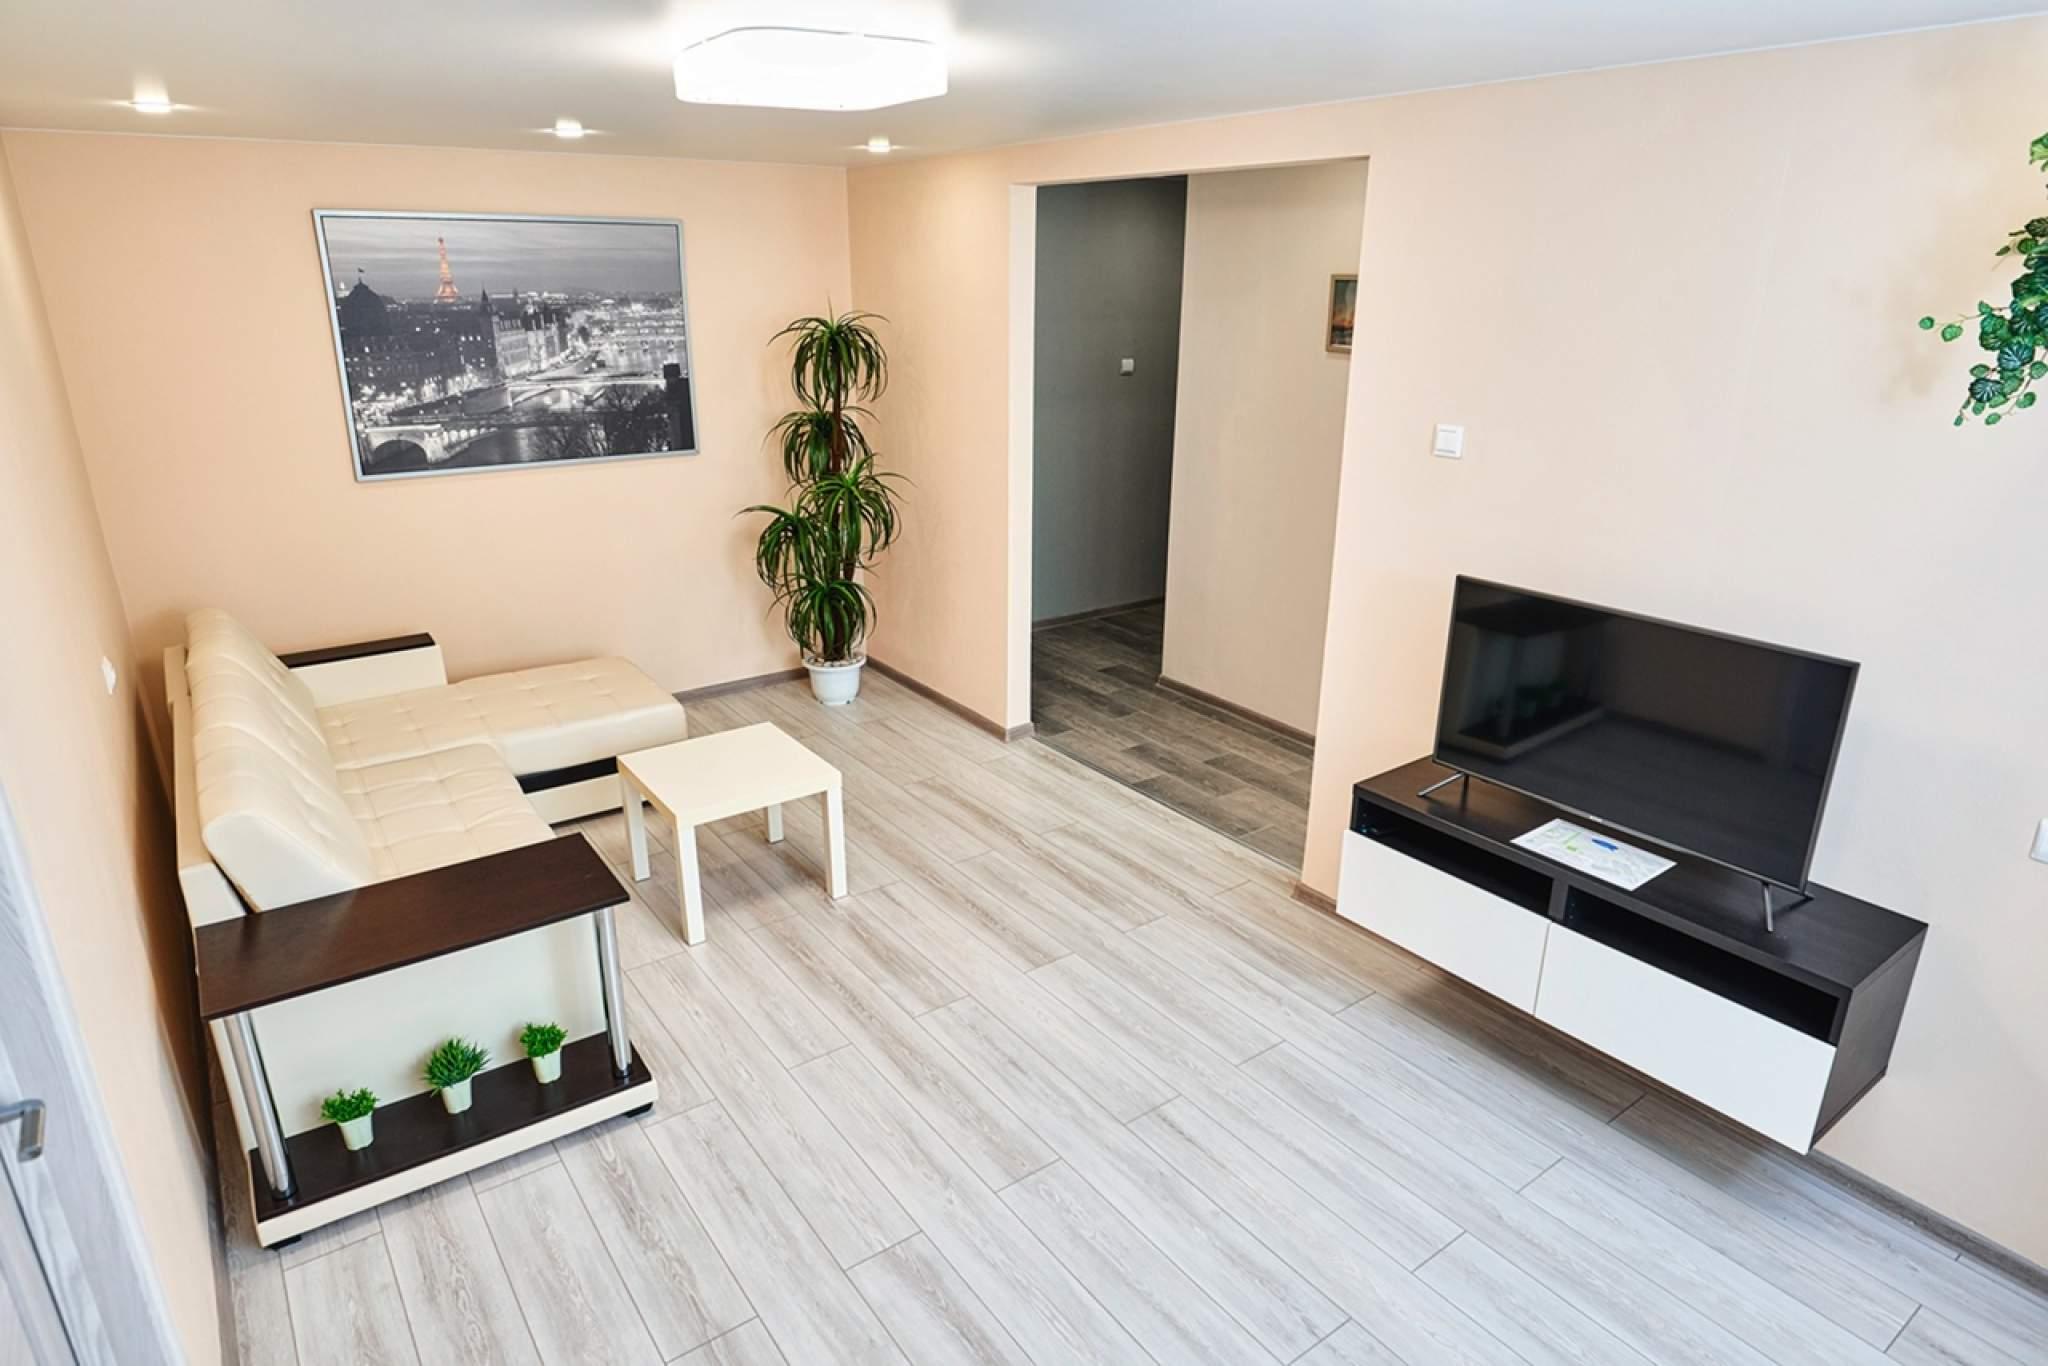 Аренда 2-комнатной квартиры, г. Тольятти, Ленина  д.20